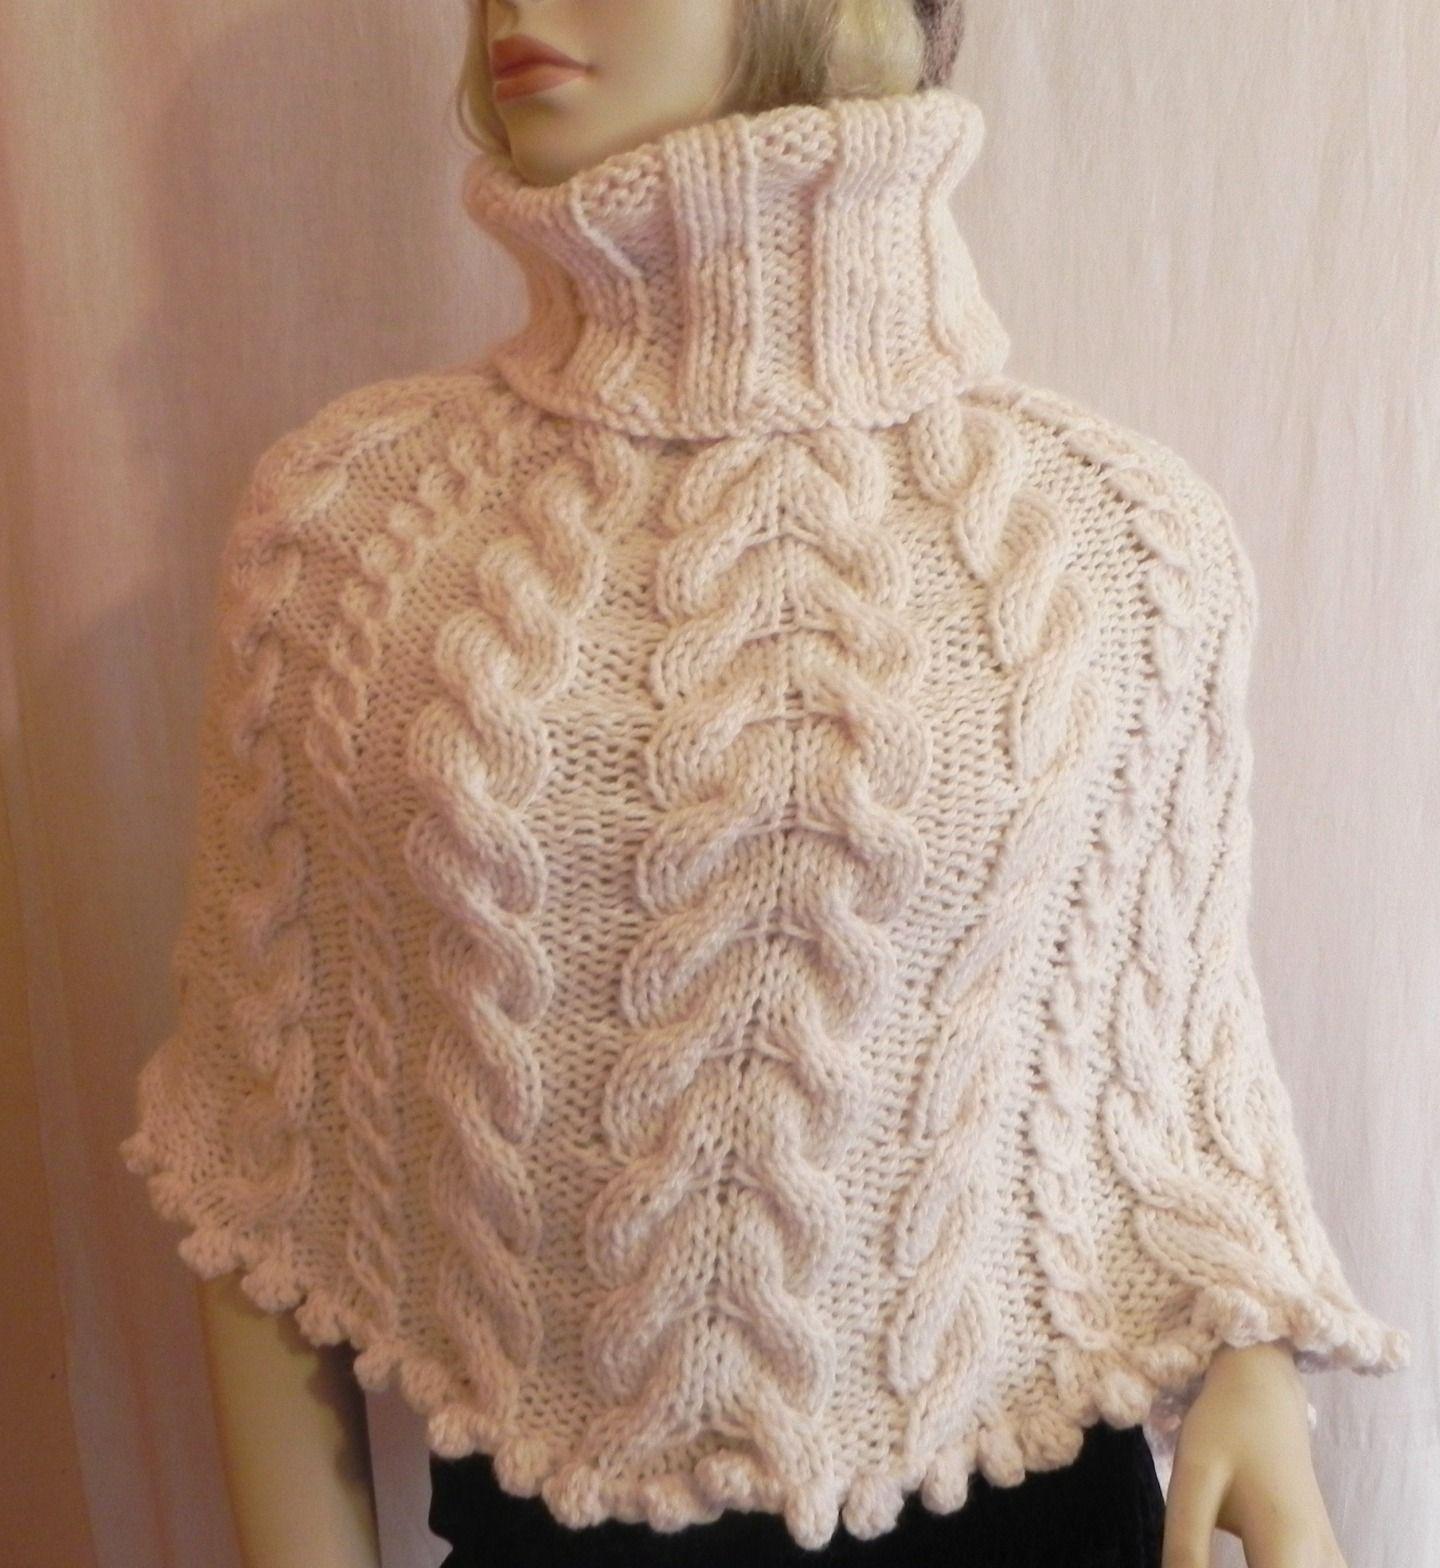 tricoter une echarpe col boule